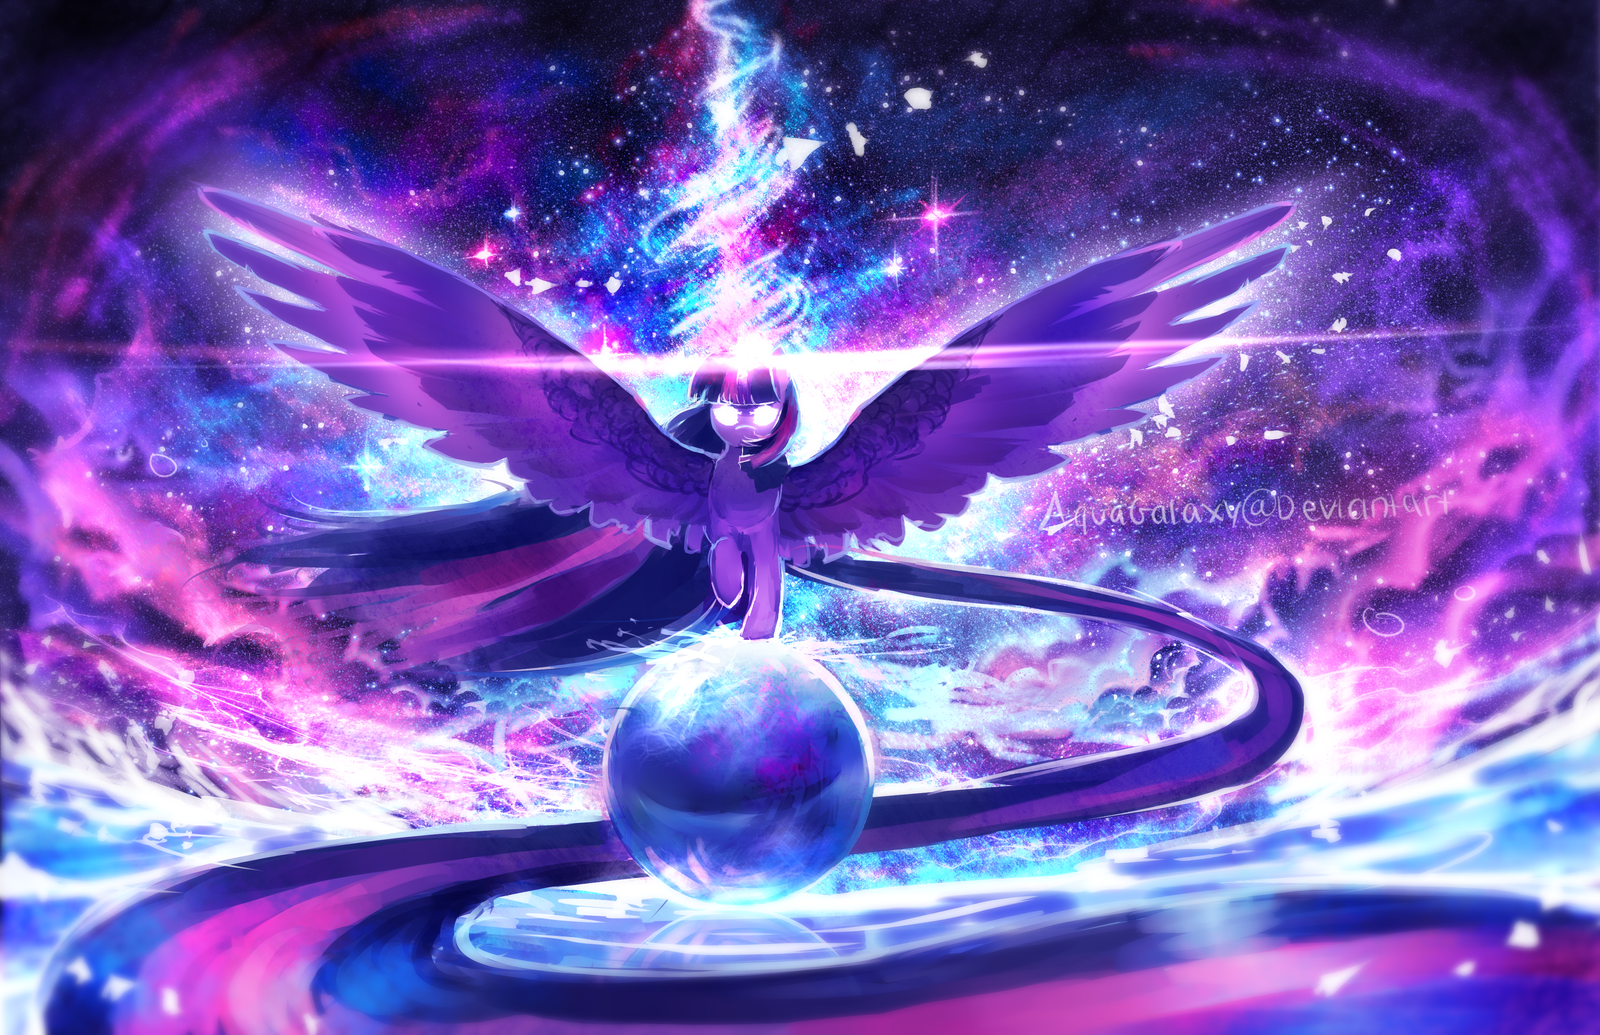 [Bild: mlp_twilight_sparkle__equilibrium_by_aqu...8fs20f.png]